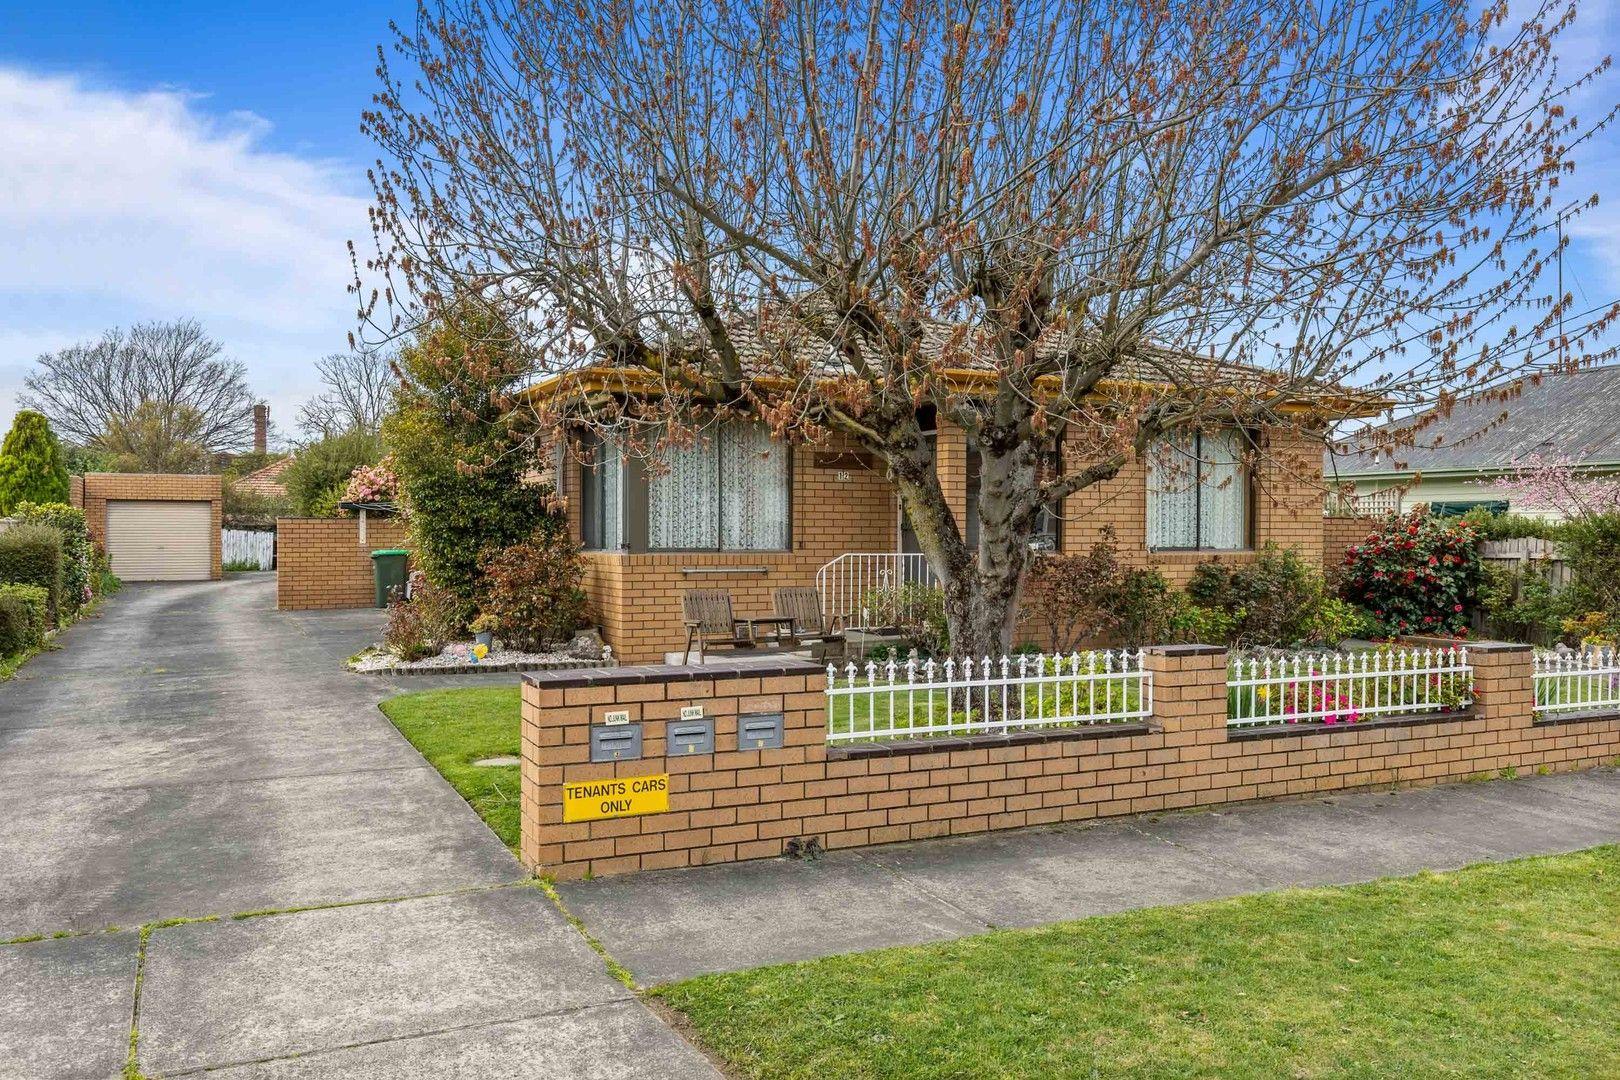 1/12 Lilley  Street, Ballarat North VIC 3350, Image 0